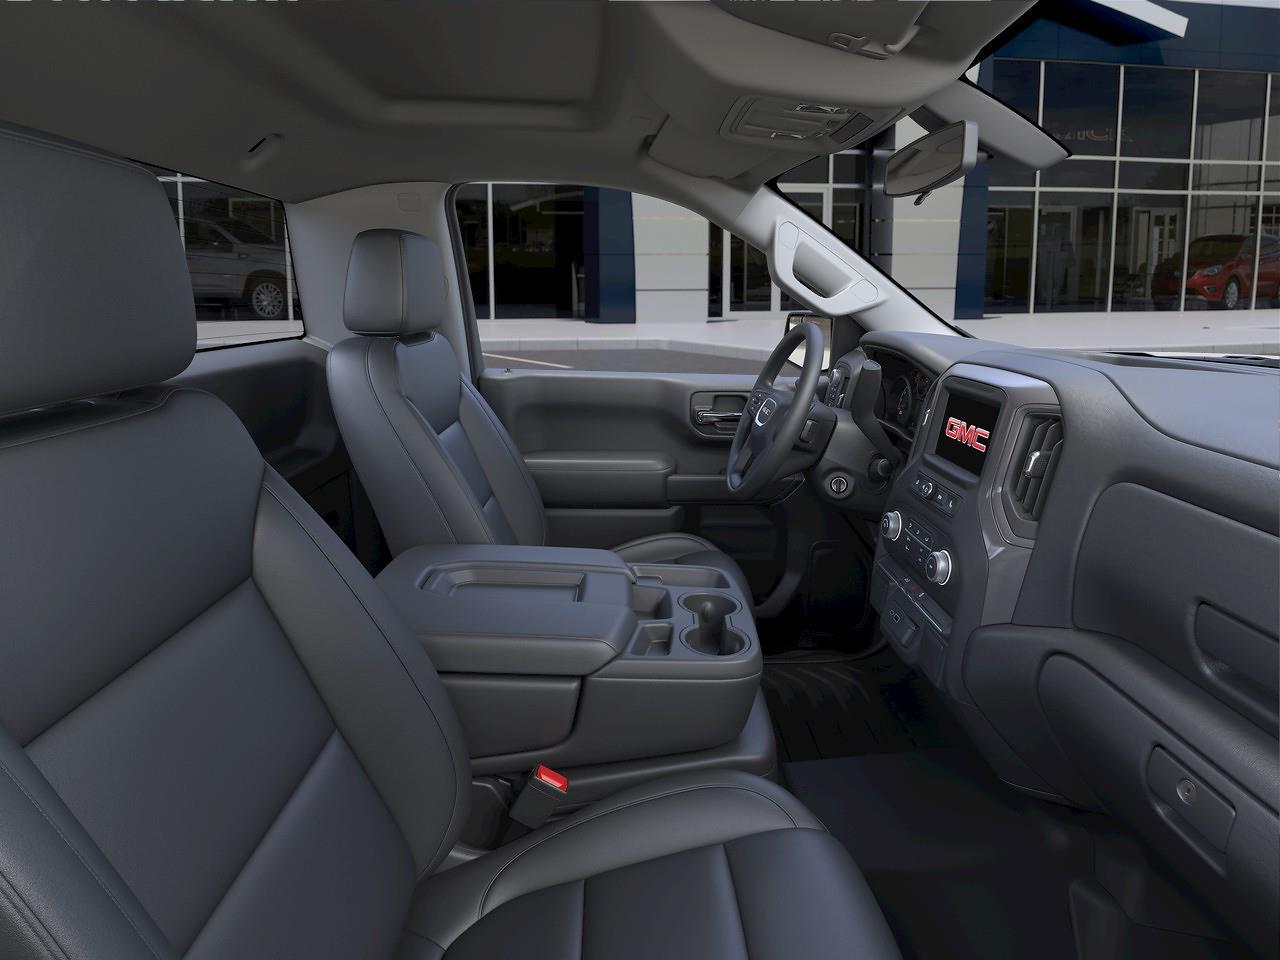 2021 GMC Sierra 1500 Regular Cab 4x4, Pickup #2A40568 - photo 14